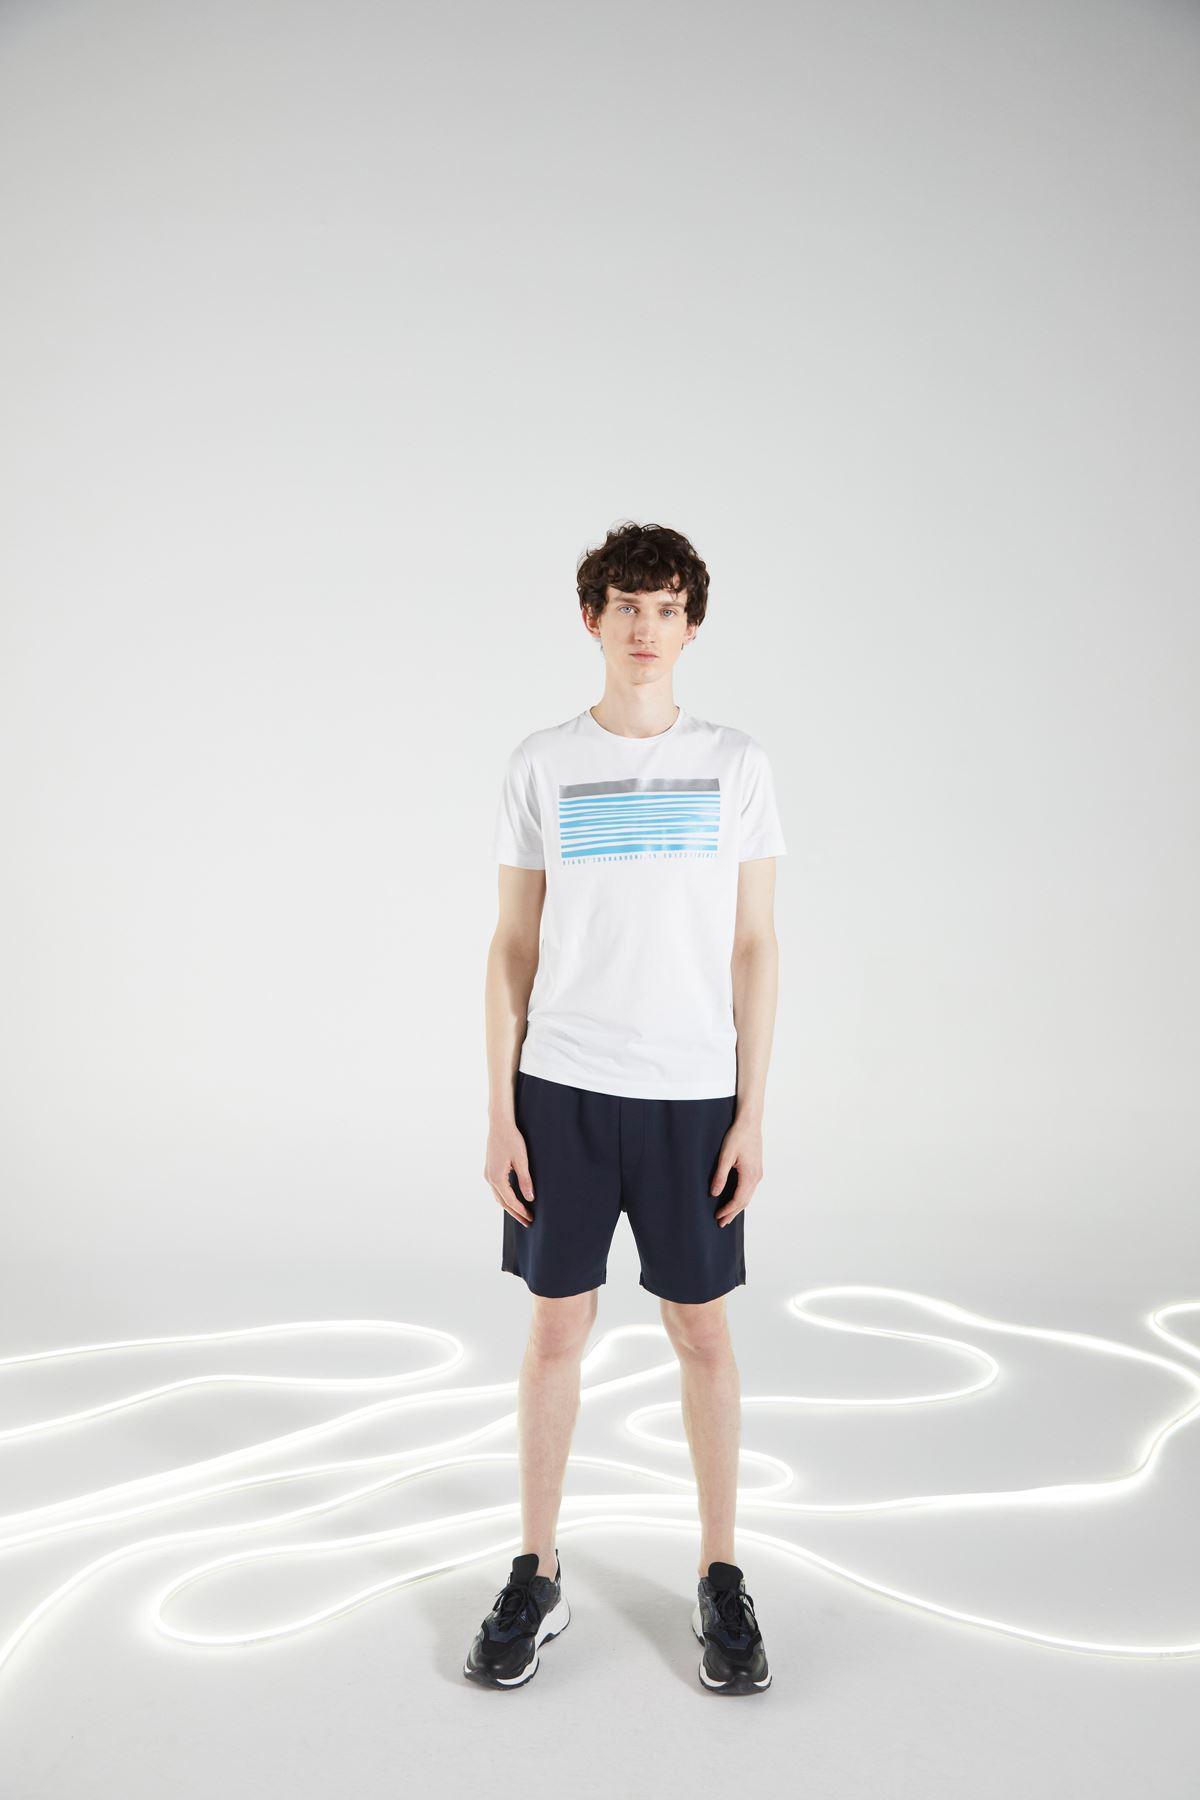 Beyaz Bisiklet Yaka Baskılı Kısa Kol Tshirt